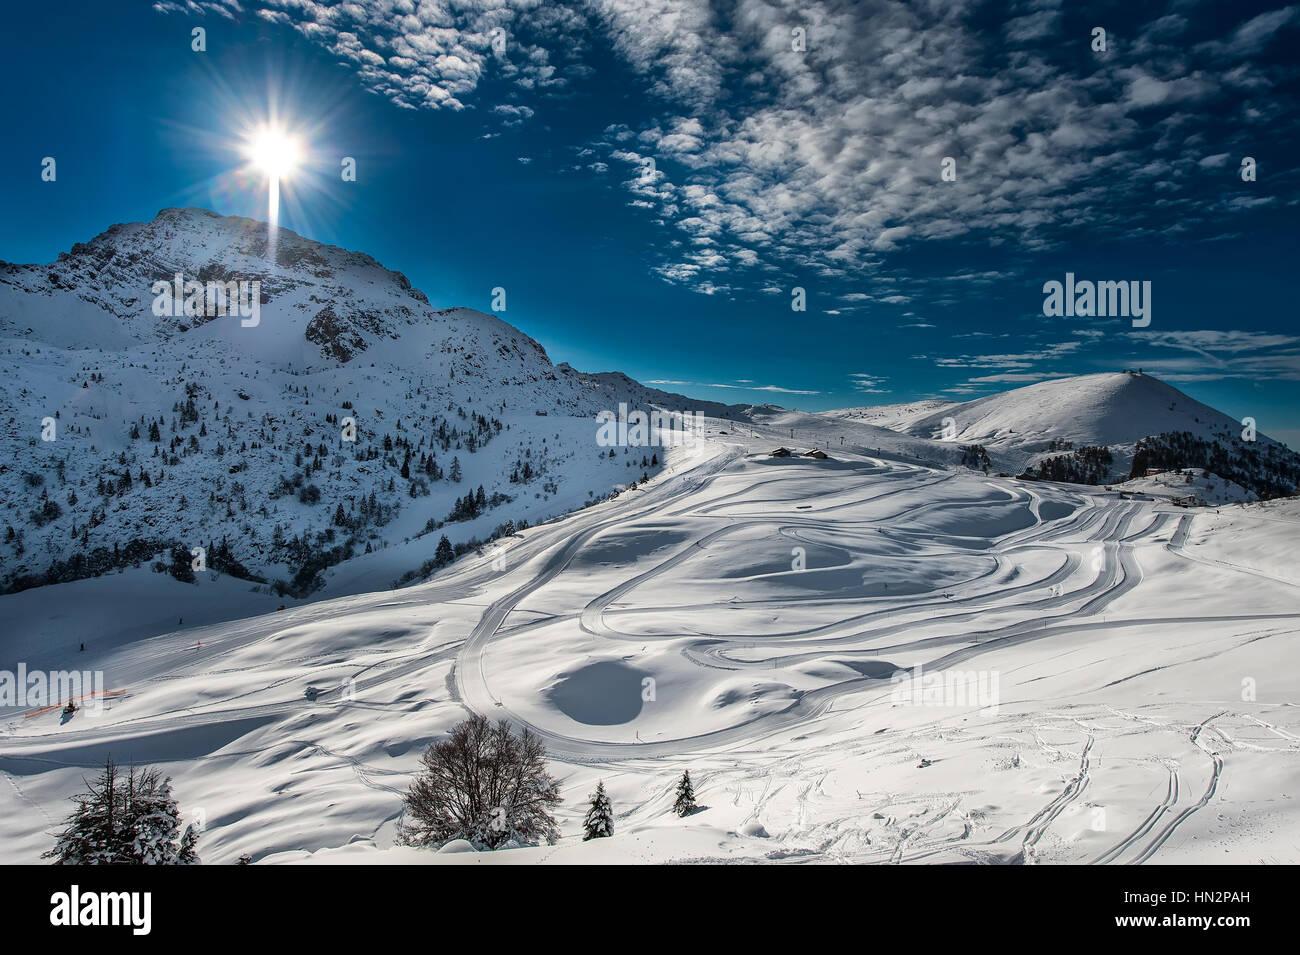 Ski cross-country skiing - Stock Image